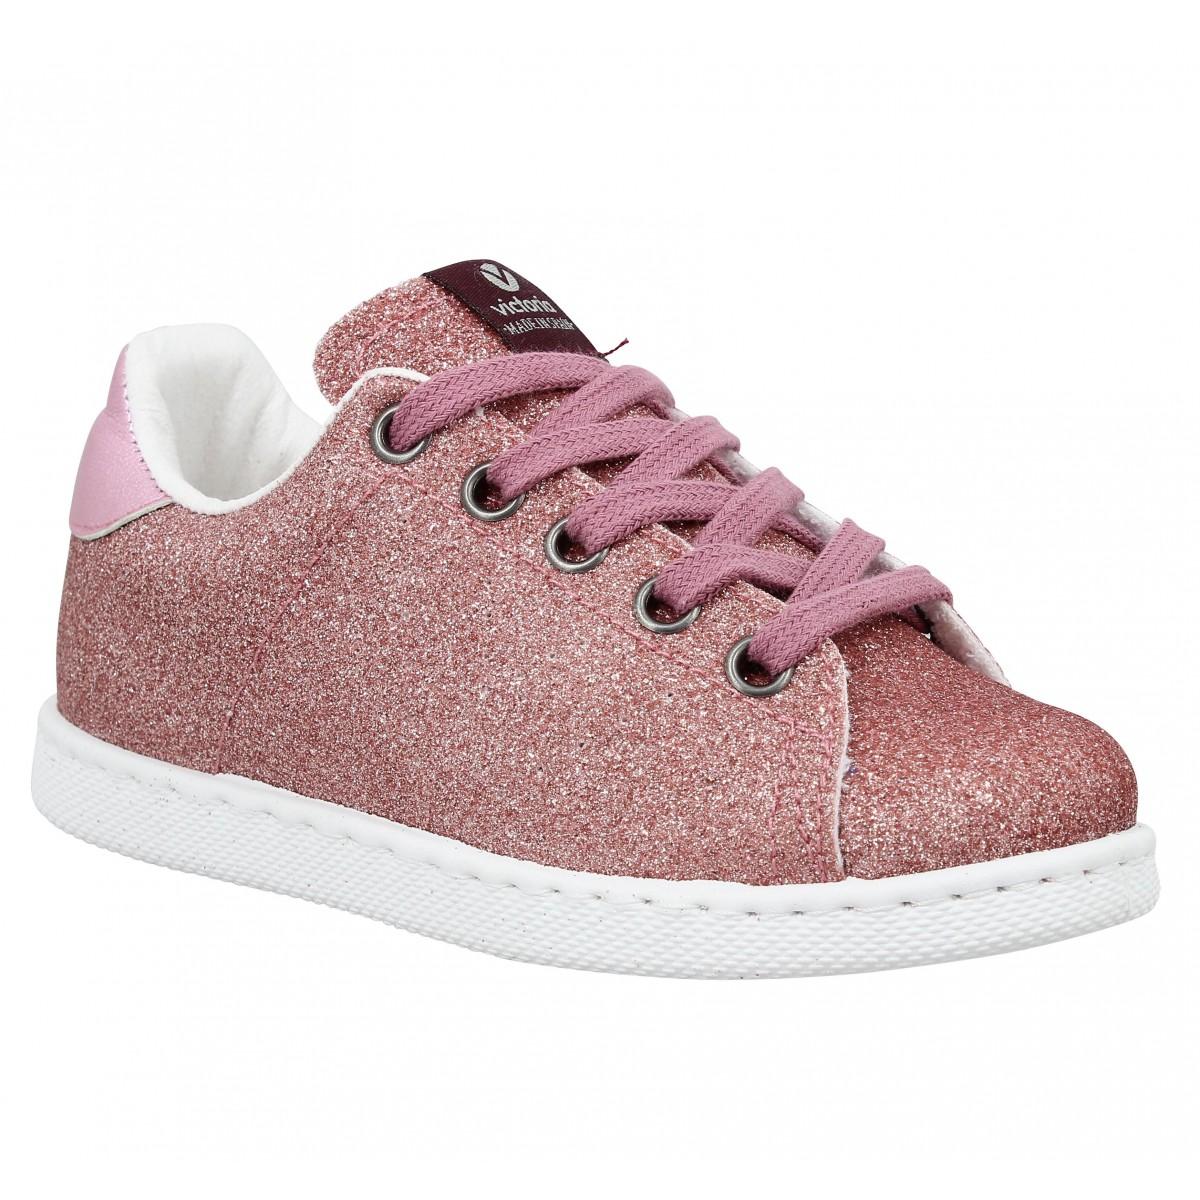 tennis enfants victoria achat vente de chaussures priceminister. Black Bedroom Furniture Sets. Home Design Ideas